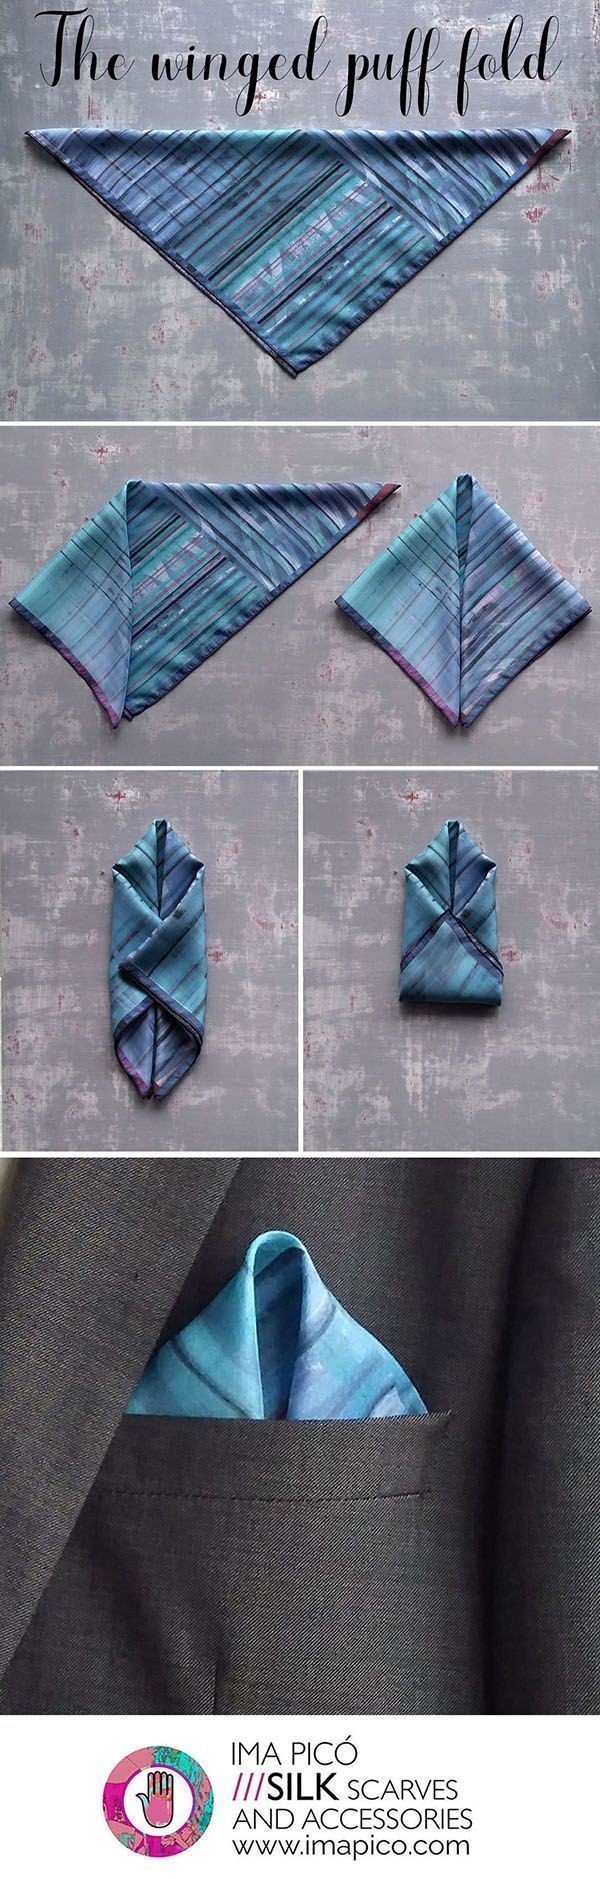 Mens Silk Pocket Square - Making Magic Happen by VIDA VIDA Free Shipping Where To Buy Low Price Wholesale Professional For Sale Dj0kB